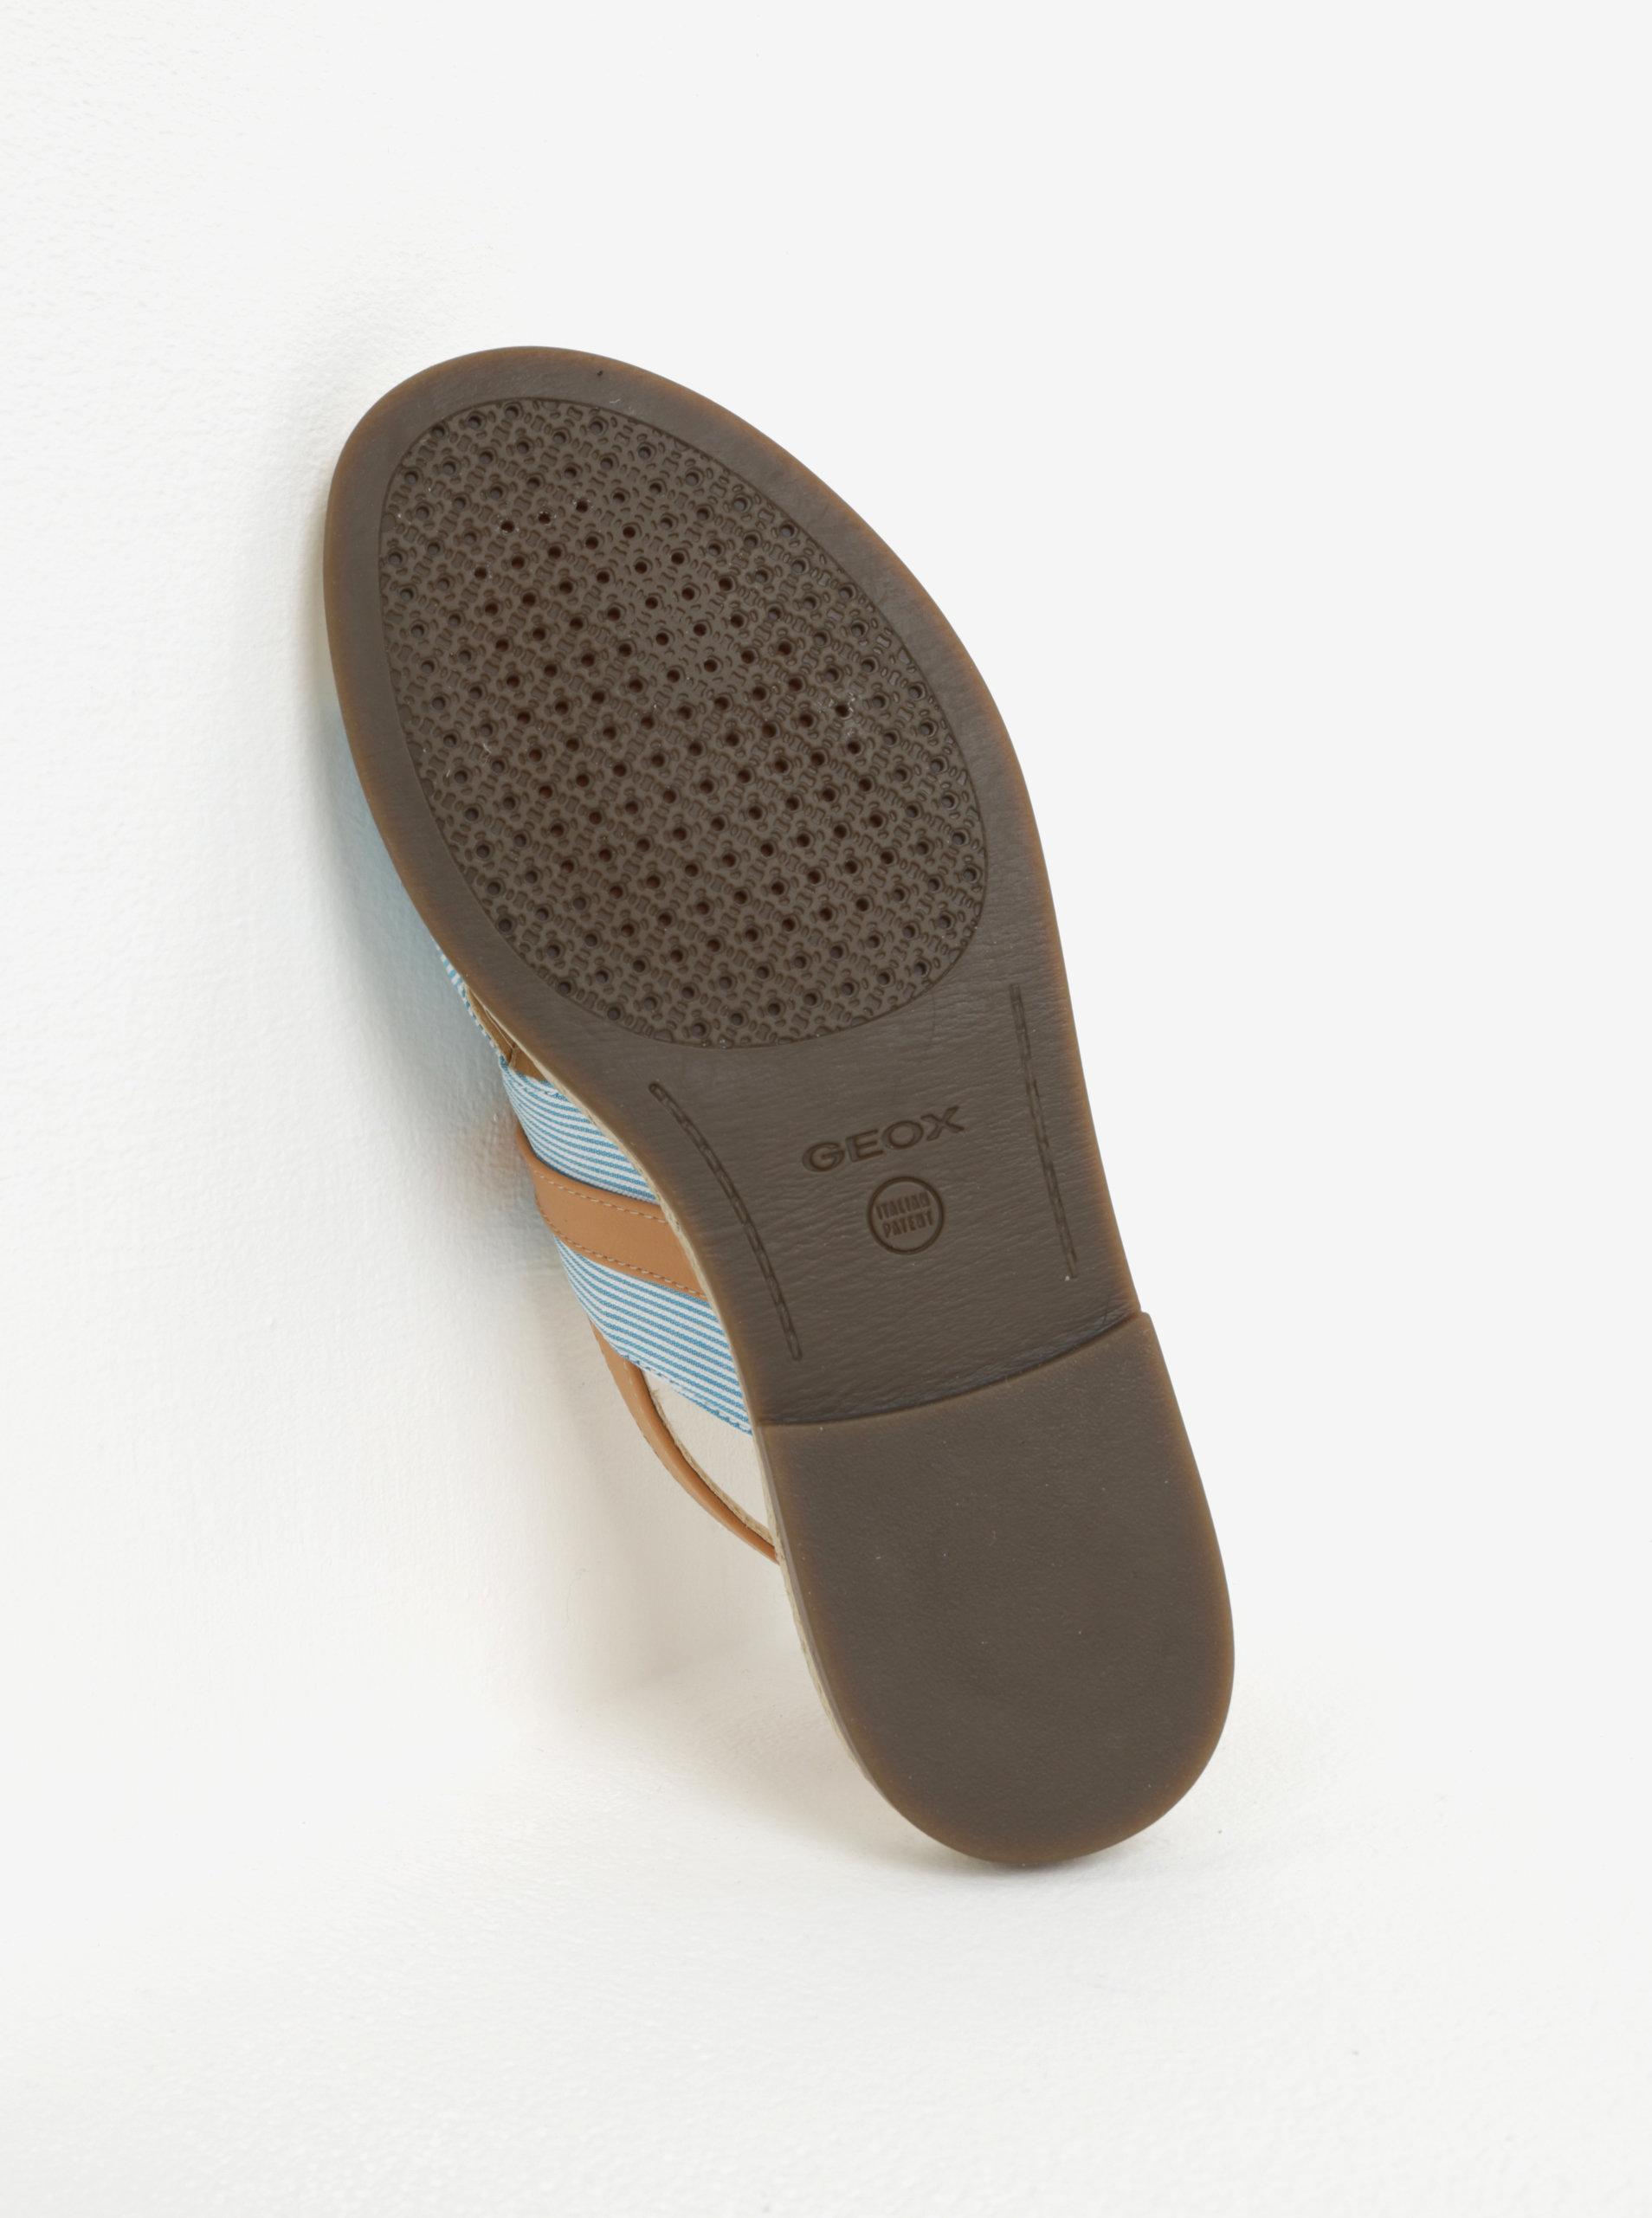 Hnědo-modré dámské sandály Geox Mary Kolleen ... 4ec6f5d458